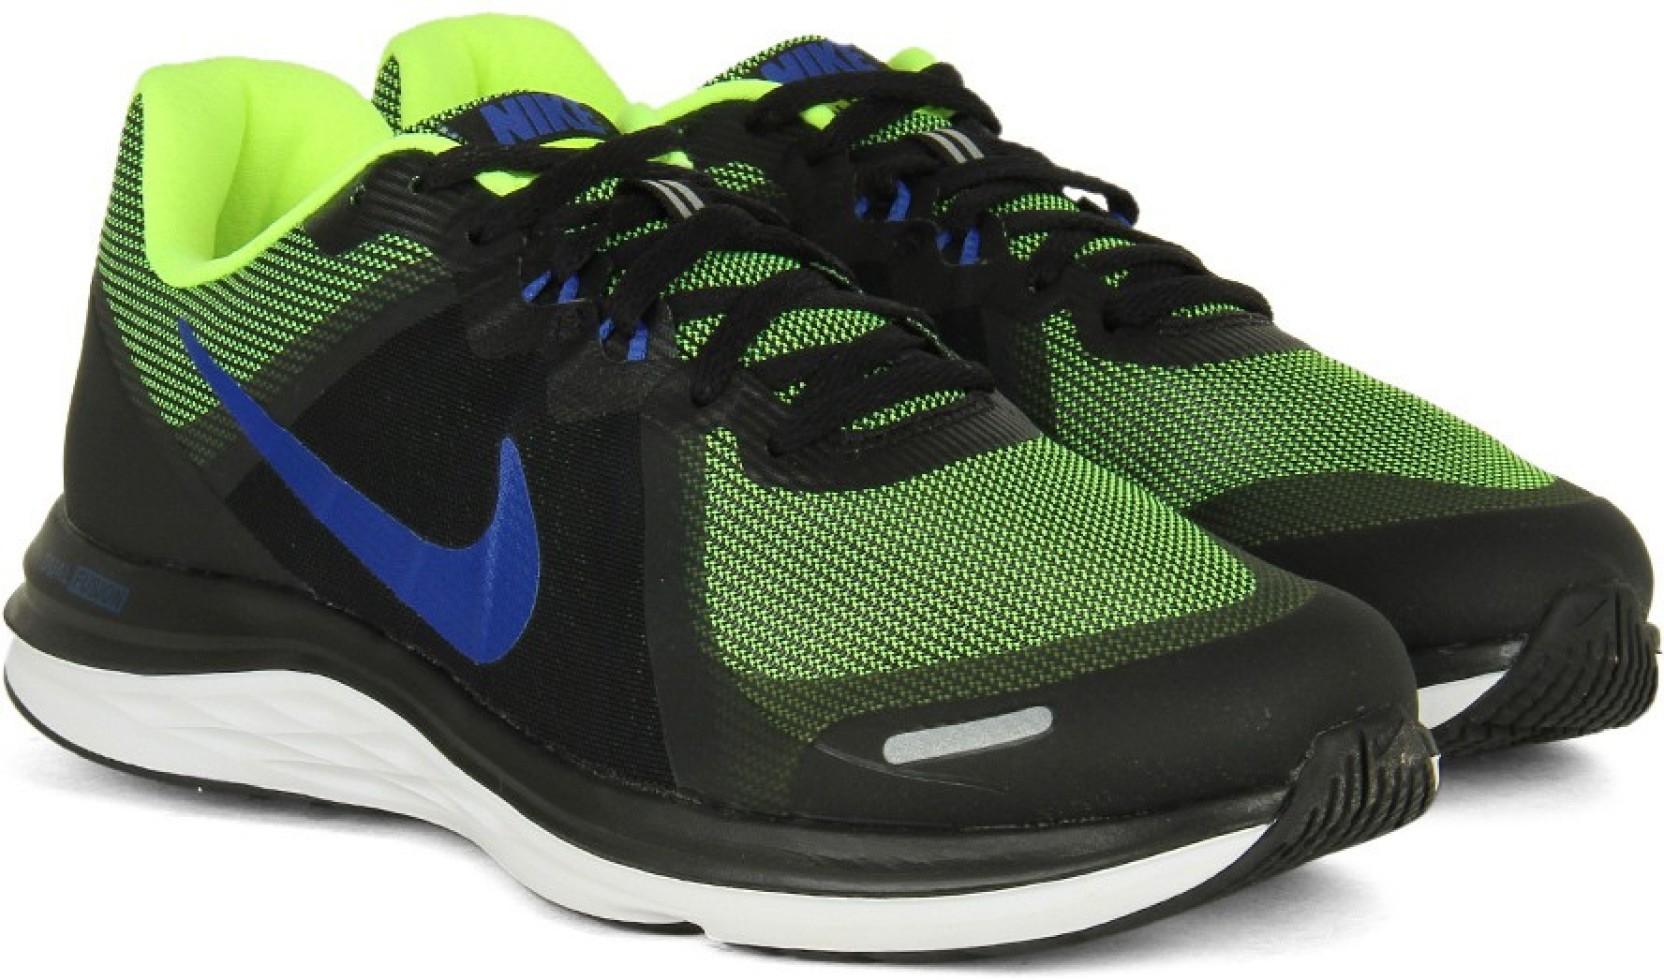 reputable site 2411e 8068c Nike DUAL FUSION X 2 Men Running Shoes For Men (Black, Blue, Green)